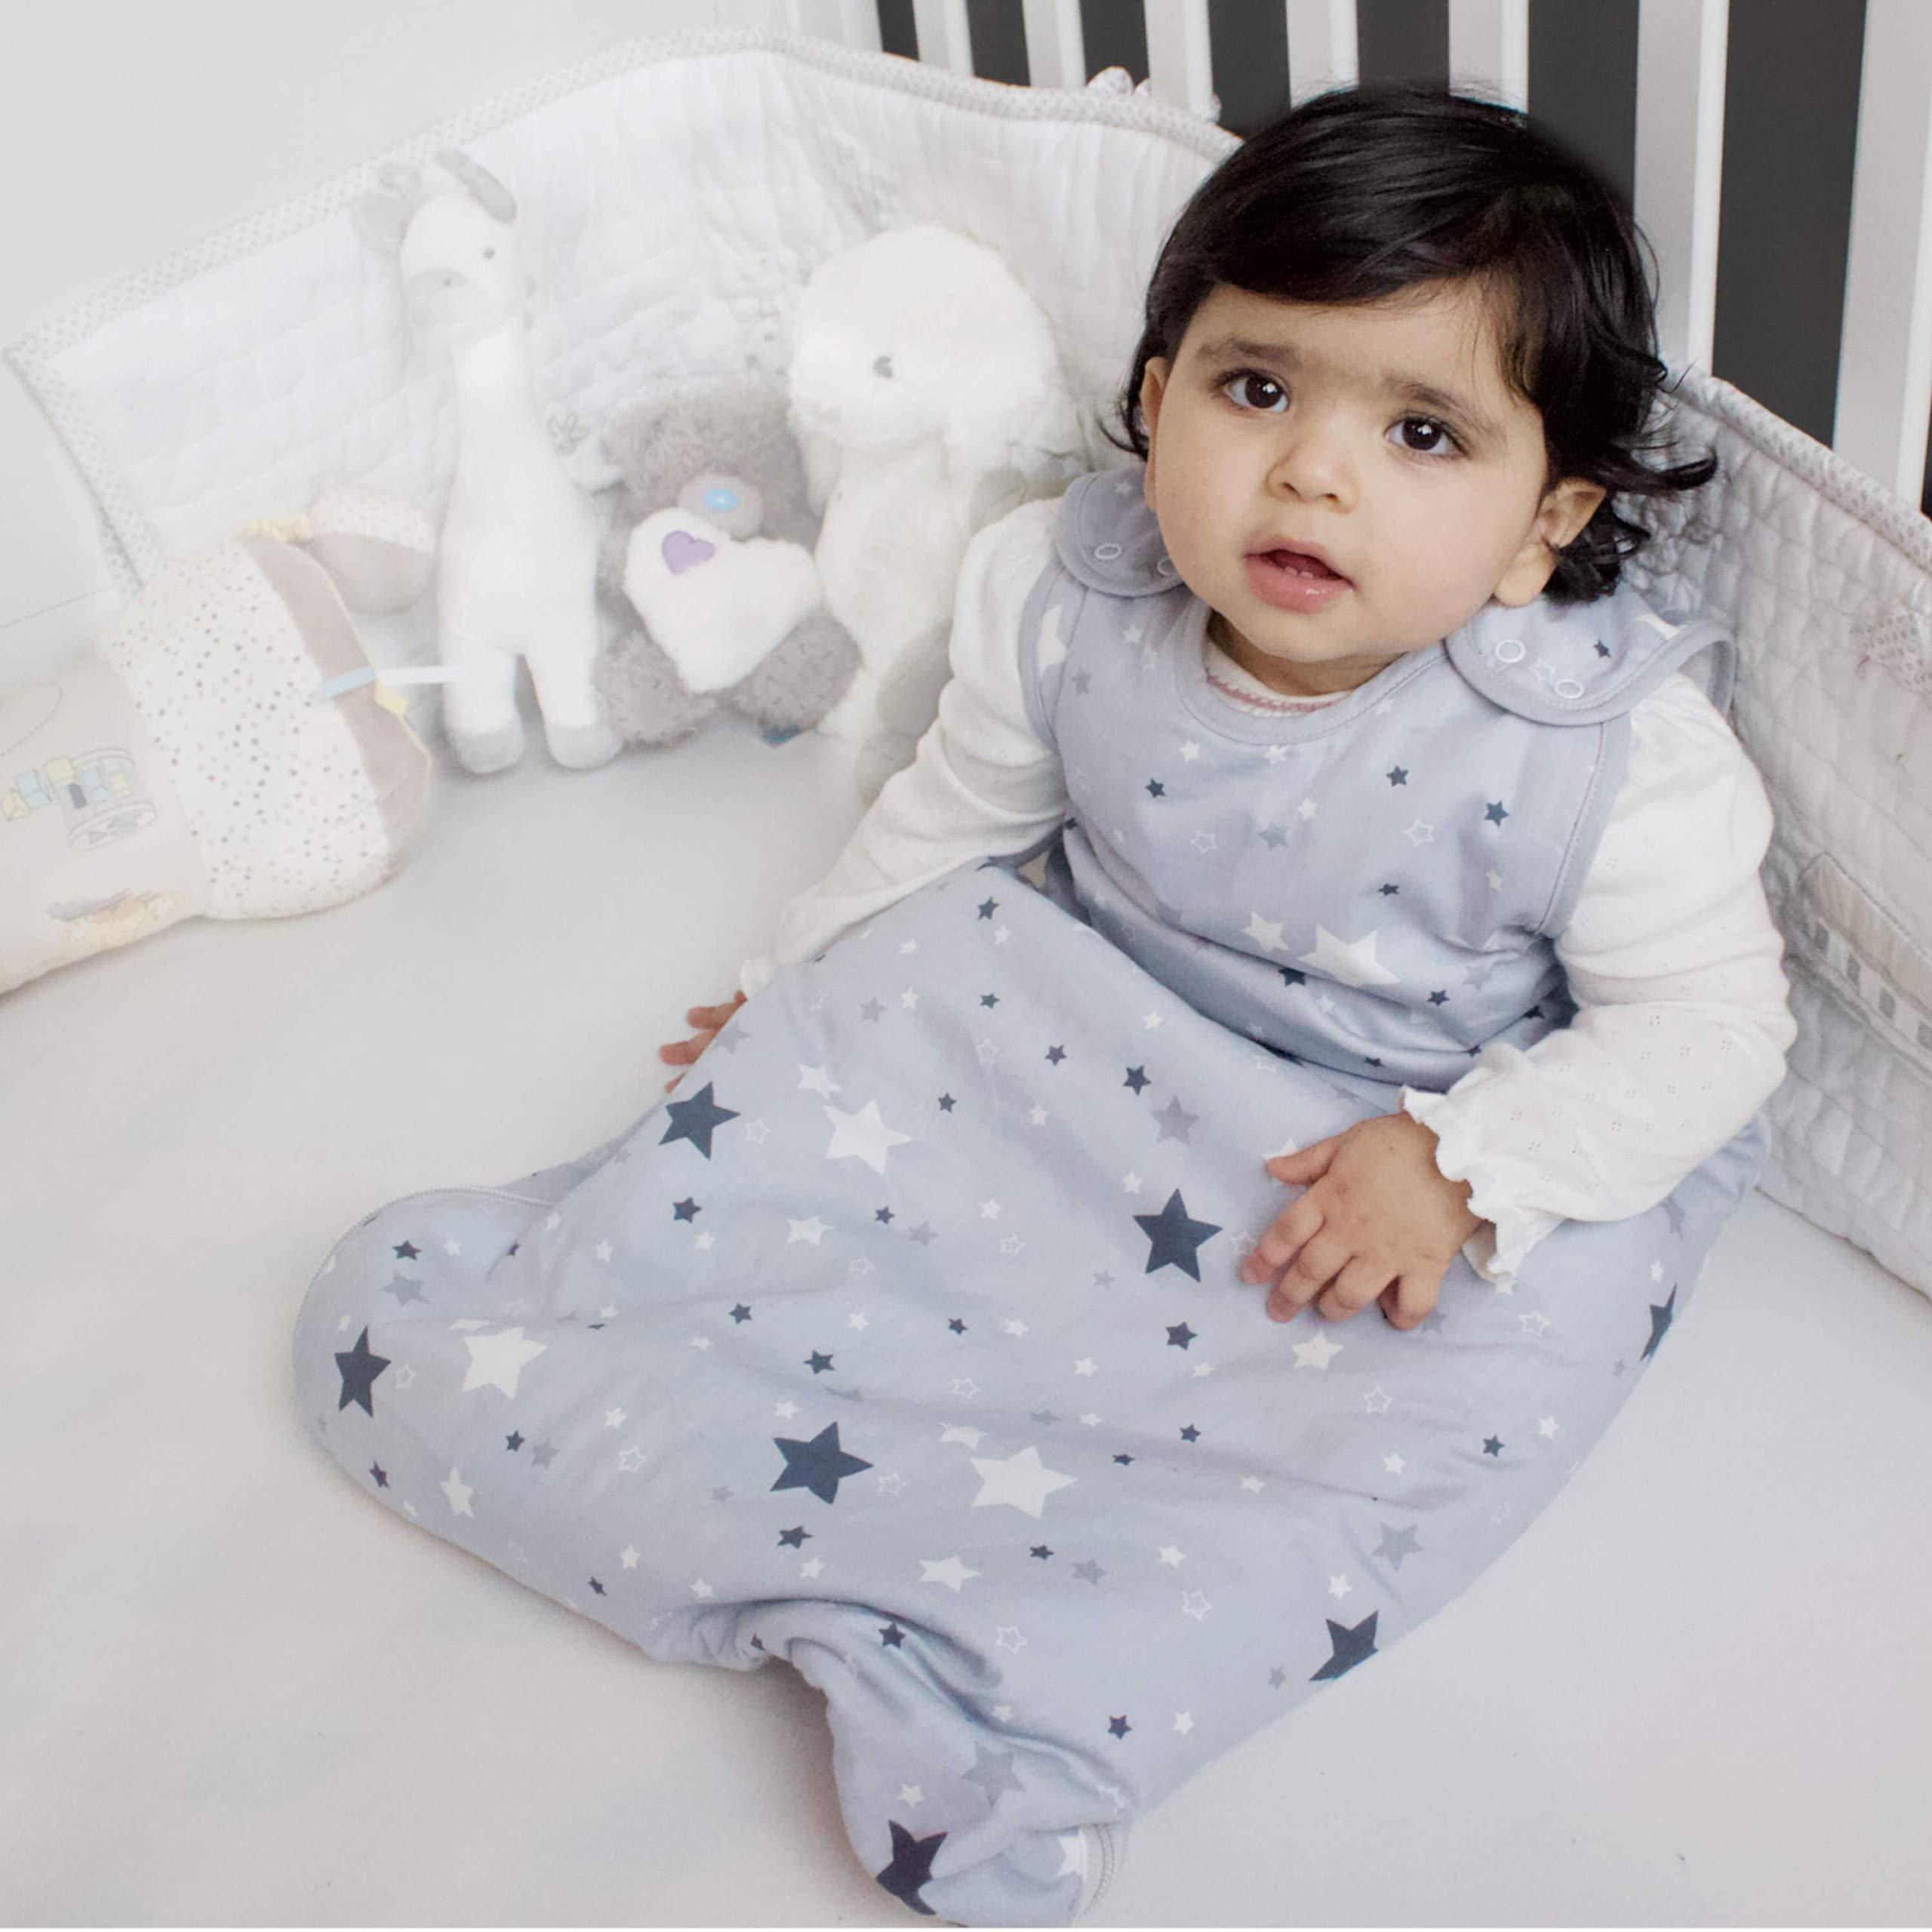 Saco de dormir para reci/én nacidos Saco de dormir para beb/és de tog 2,5 Be Babe 0-6 meses camas y viajes Doble cremallera Estrella Rosa Mantas envolventes para cunas beb/é ni/ñas